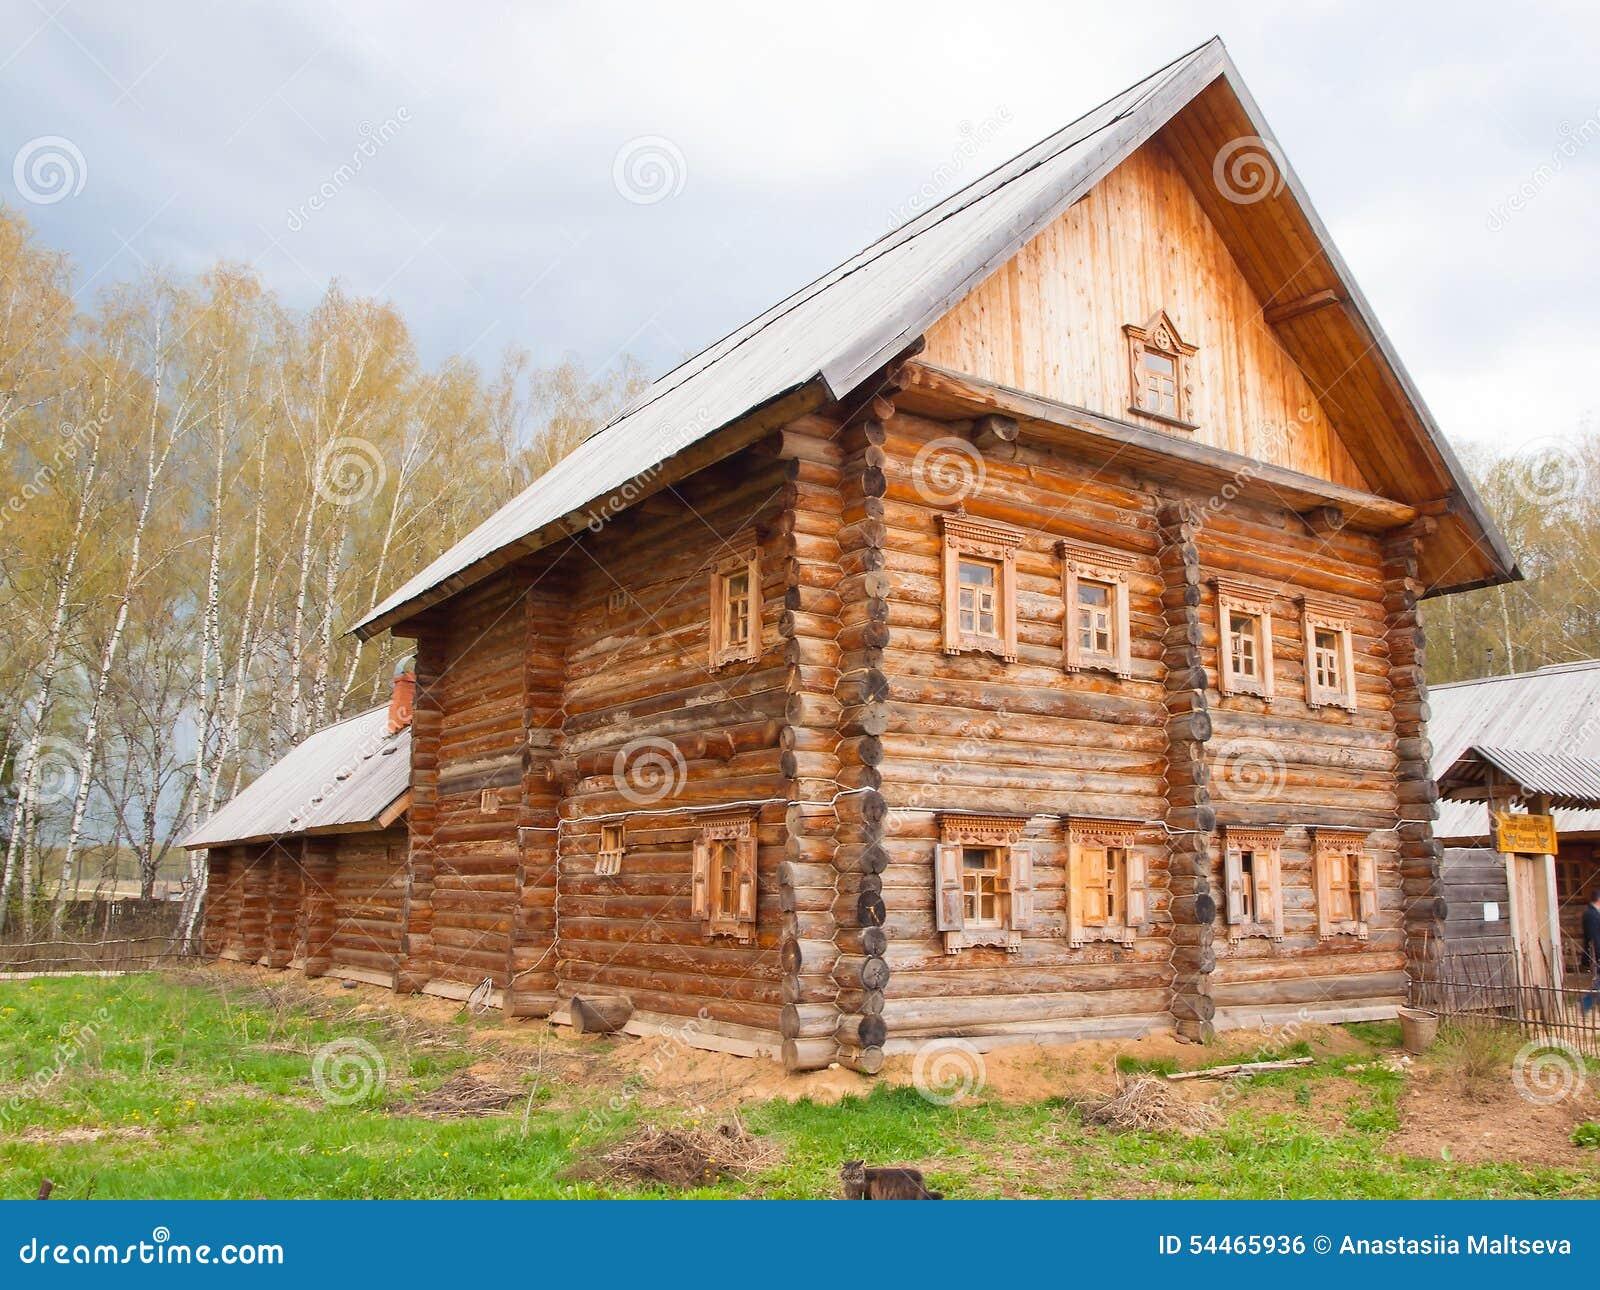 cabane en rondins en bois dans le village russe en russie moyenne photo stock image 54465936. Black Bedroom Furniture Sets. Home Design Ideas